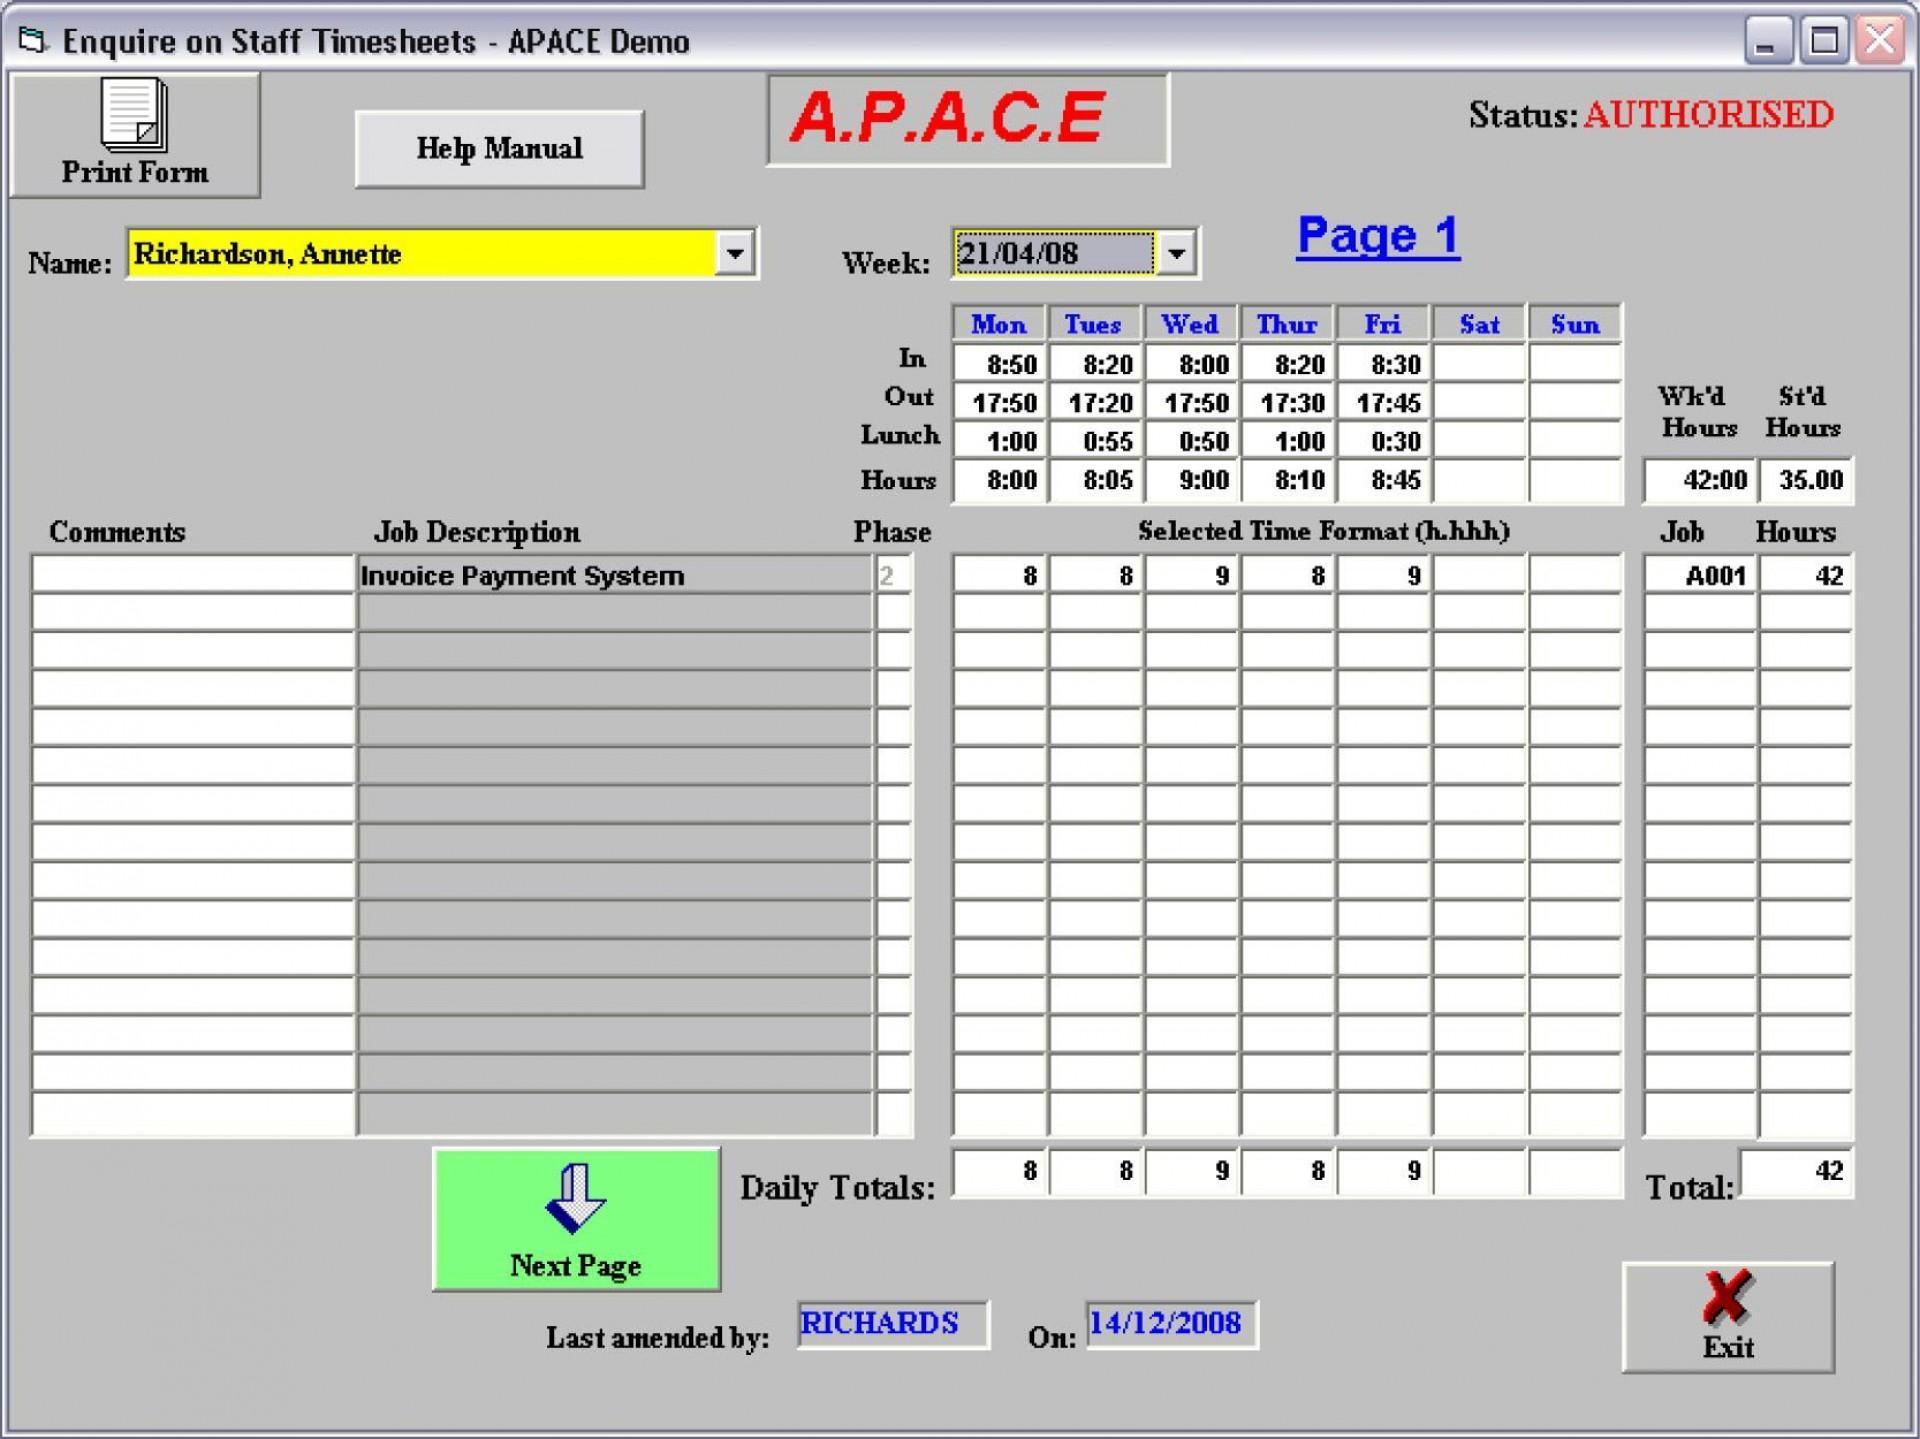 001 Awful Microsoft Acces Employee Time Card Template Idea 1920